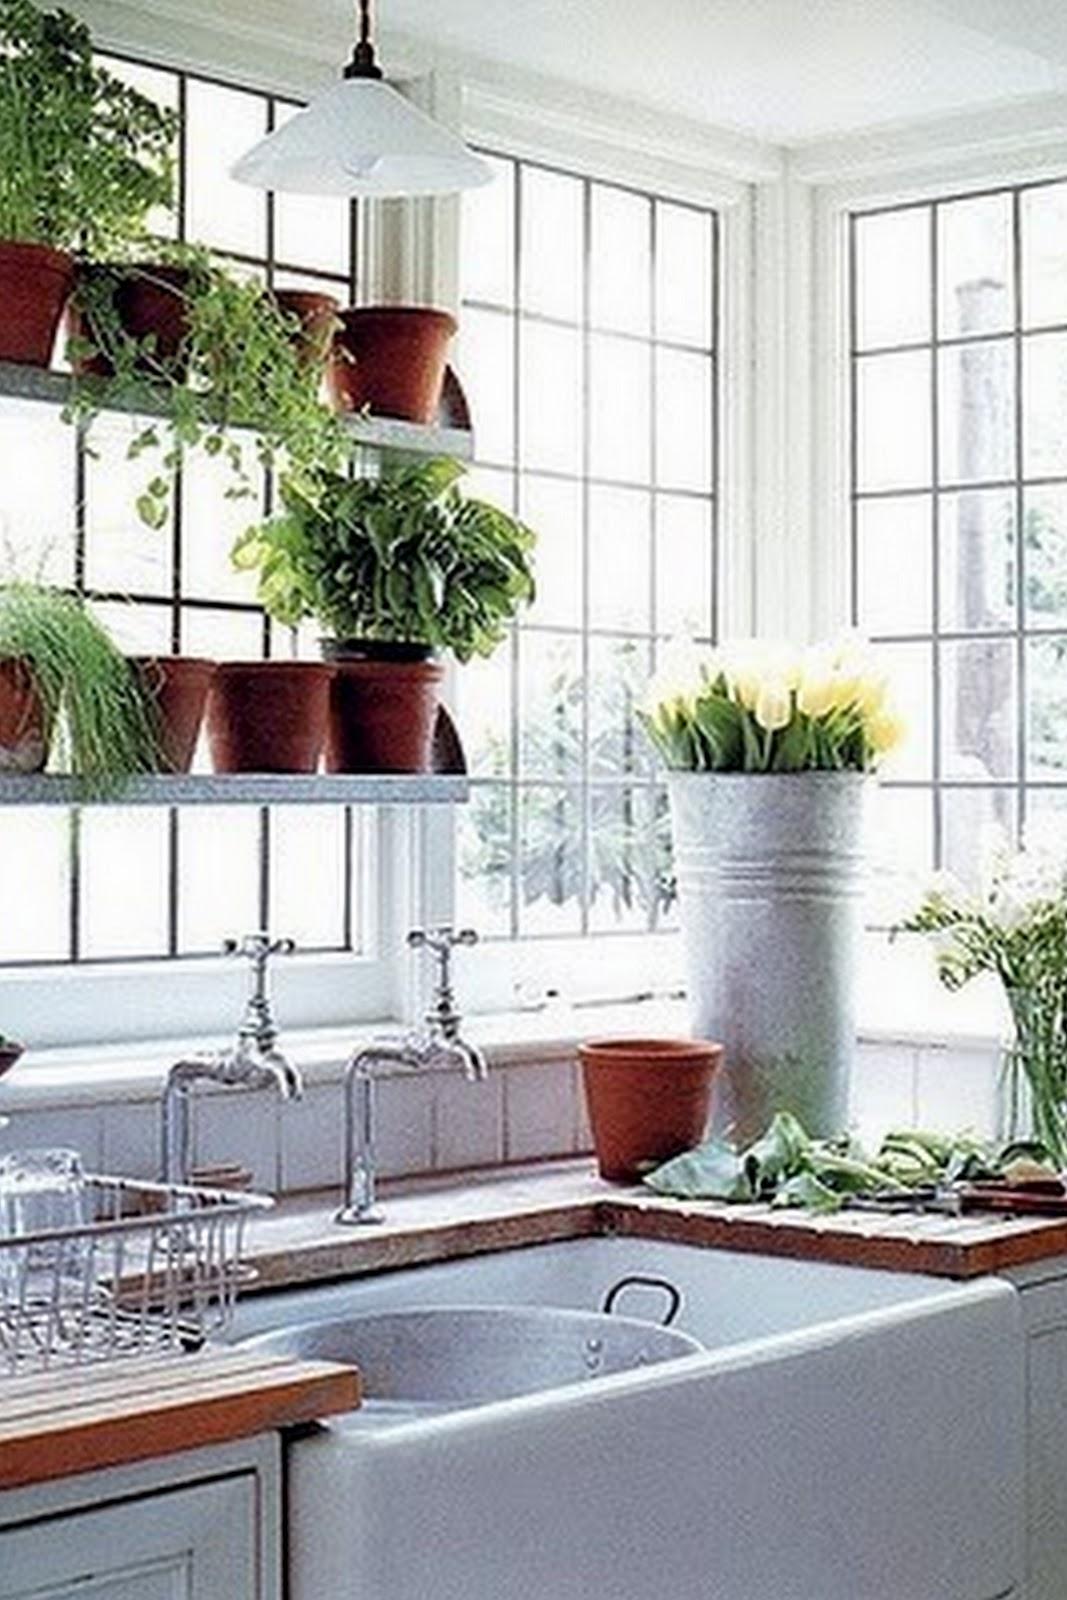 Garden Kitchen Window Hansgrohe Faucet Costco Toques E Retoques Prateleiras Na Janela Da Cozinha 1